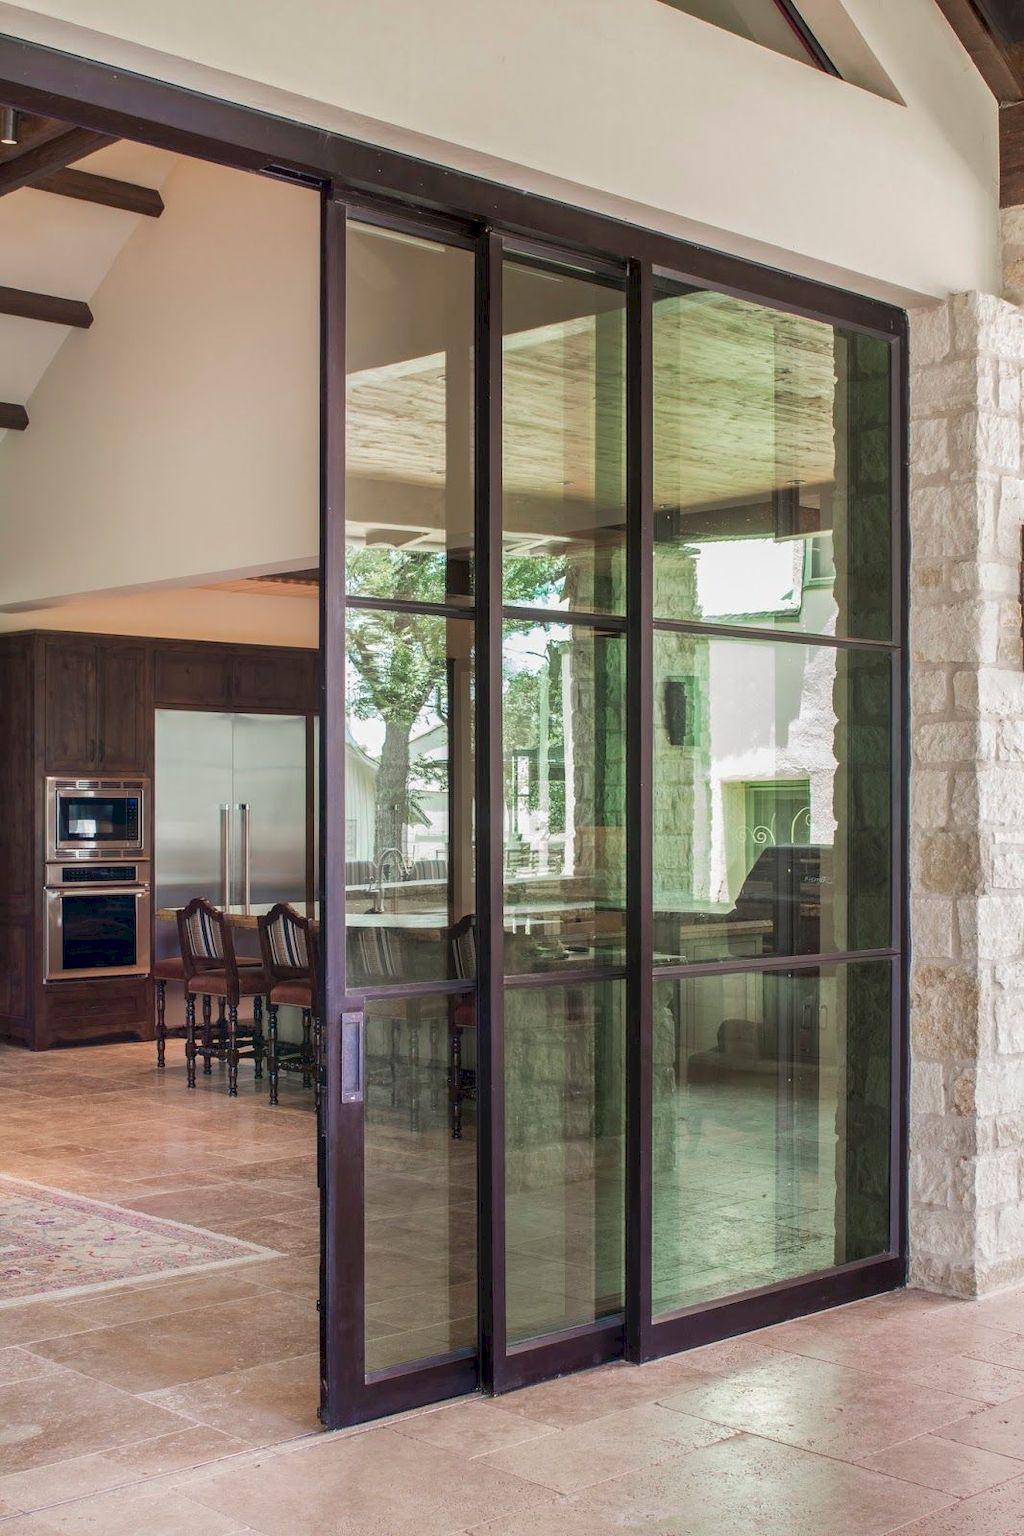 50 Awesome Decorative Glass Doors Ideas Home To Z Steel Doors And Windows Sliding Doors Interior Sliding Door Design